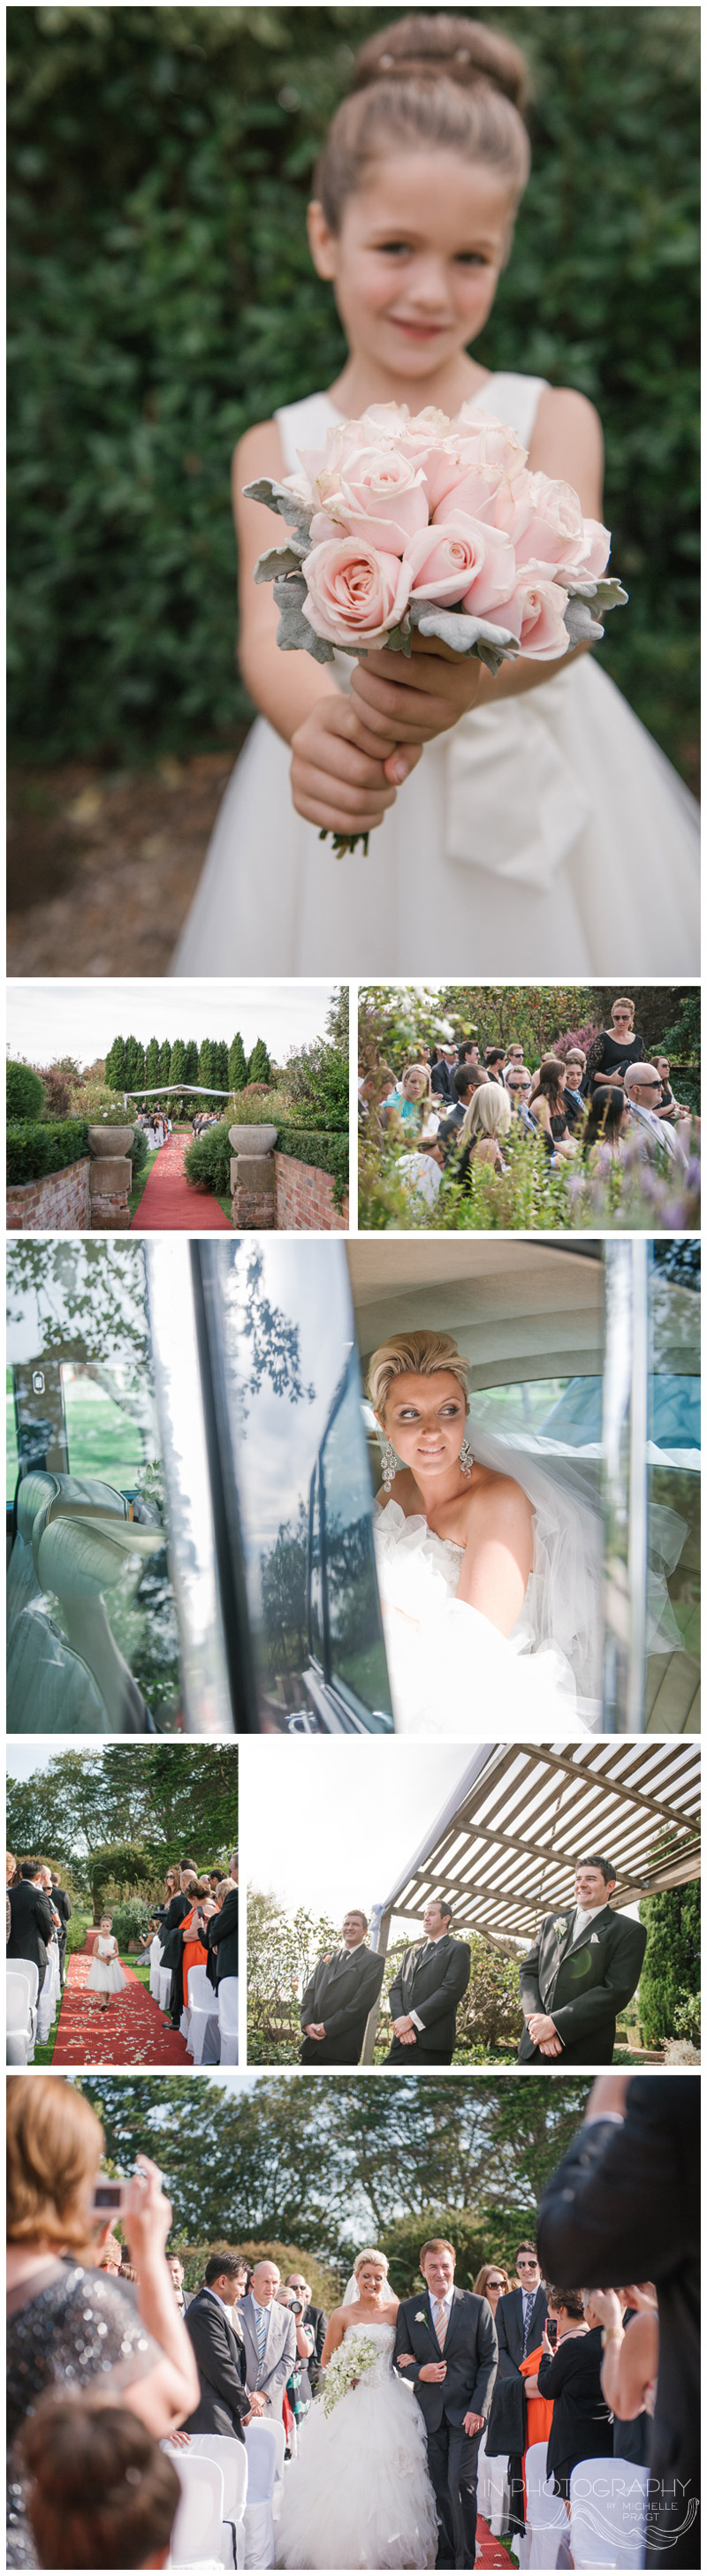 Blog-Collage-1368603308197